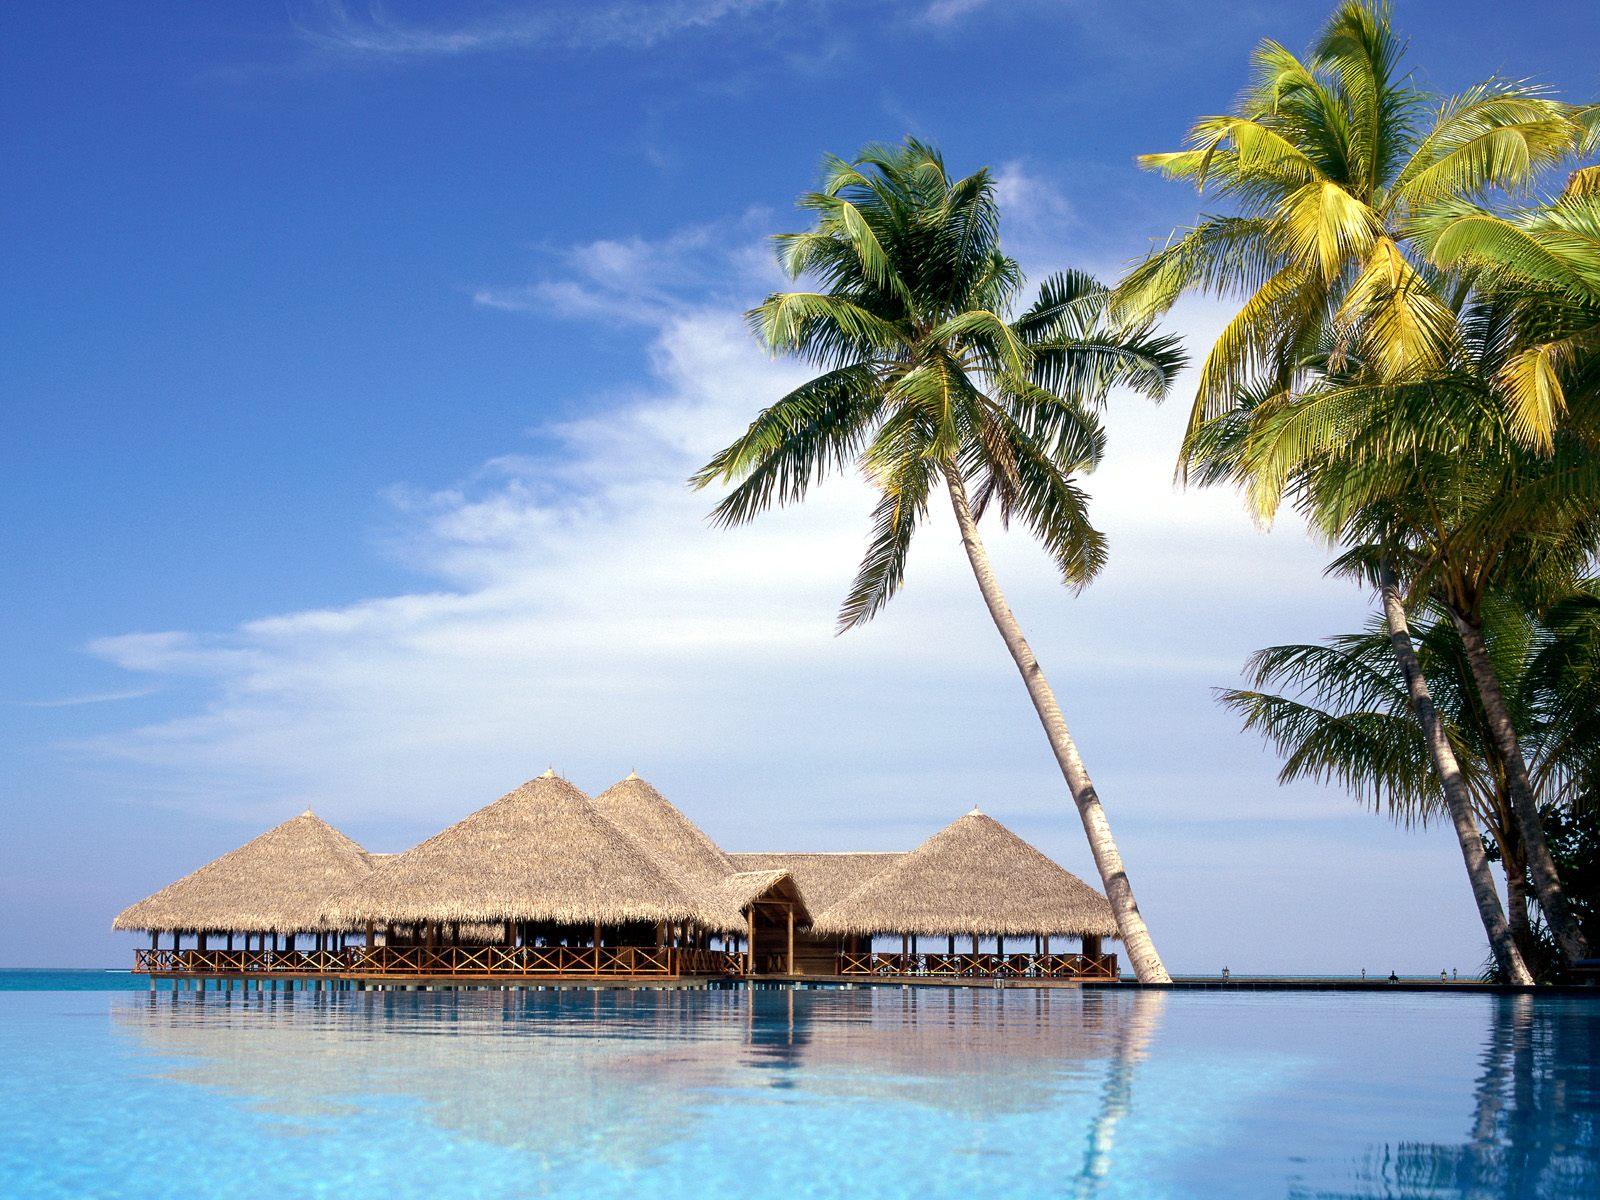 Maldives Island Desktop Backgrounds Maldives Island Desktop 1600x1200